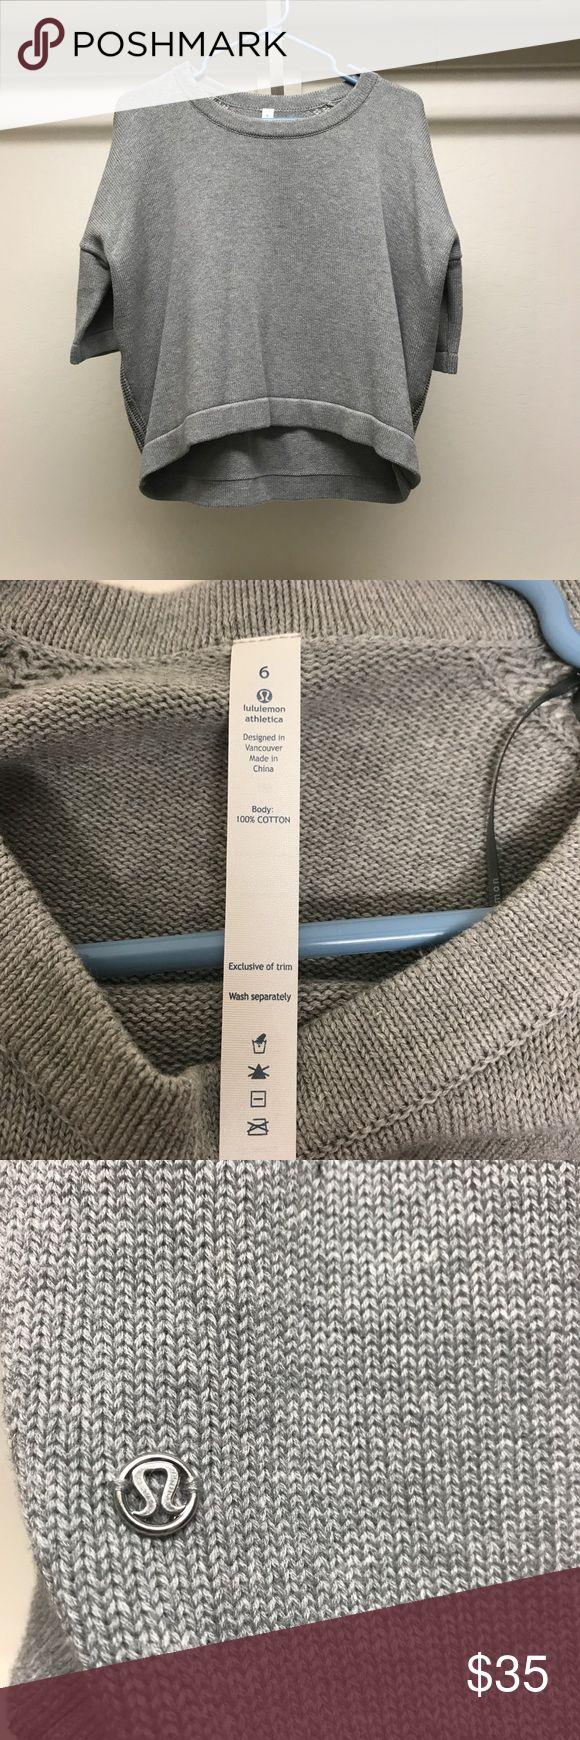 Selling this Lululemon Women's Grey Short Sleeved Top Size 6 on Poshmark! My username is: vjethier. #shopmycloset #poshmark #fashion #shopping #style #forsale #lululemon athletica #Tops